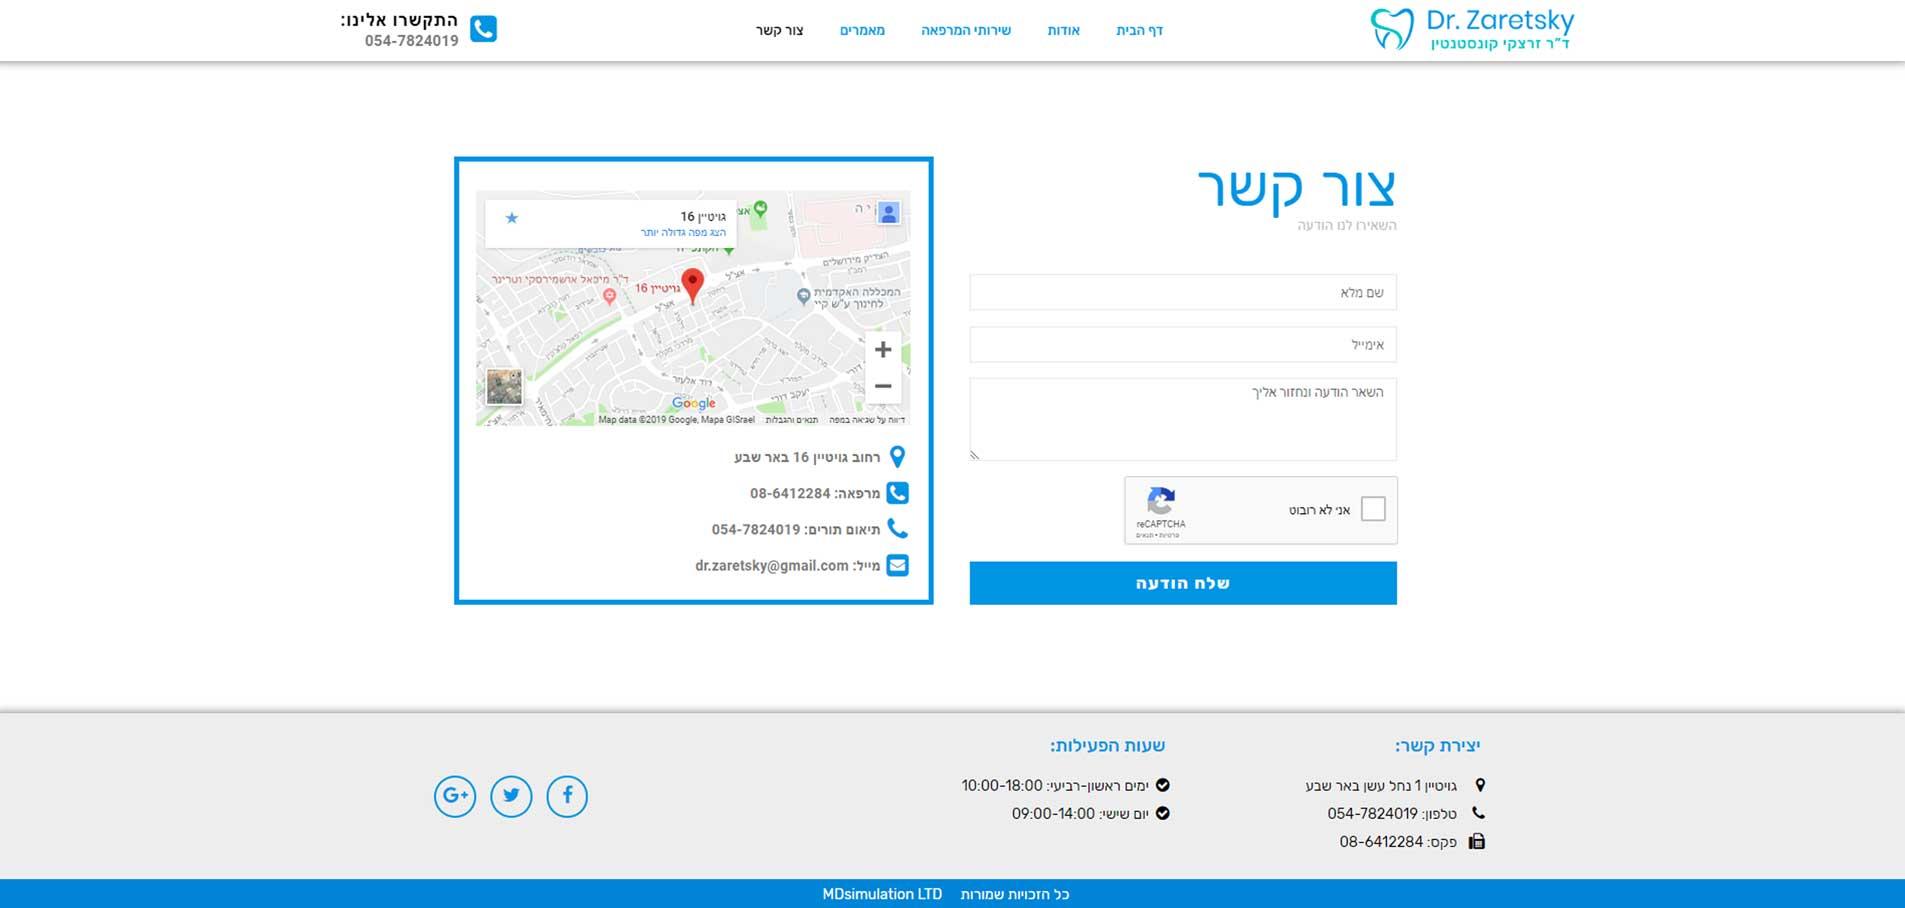 Dr. Zaretsky contact web page